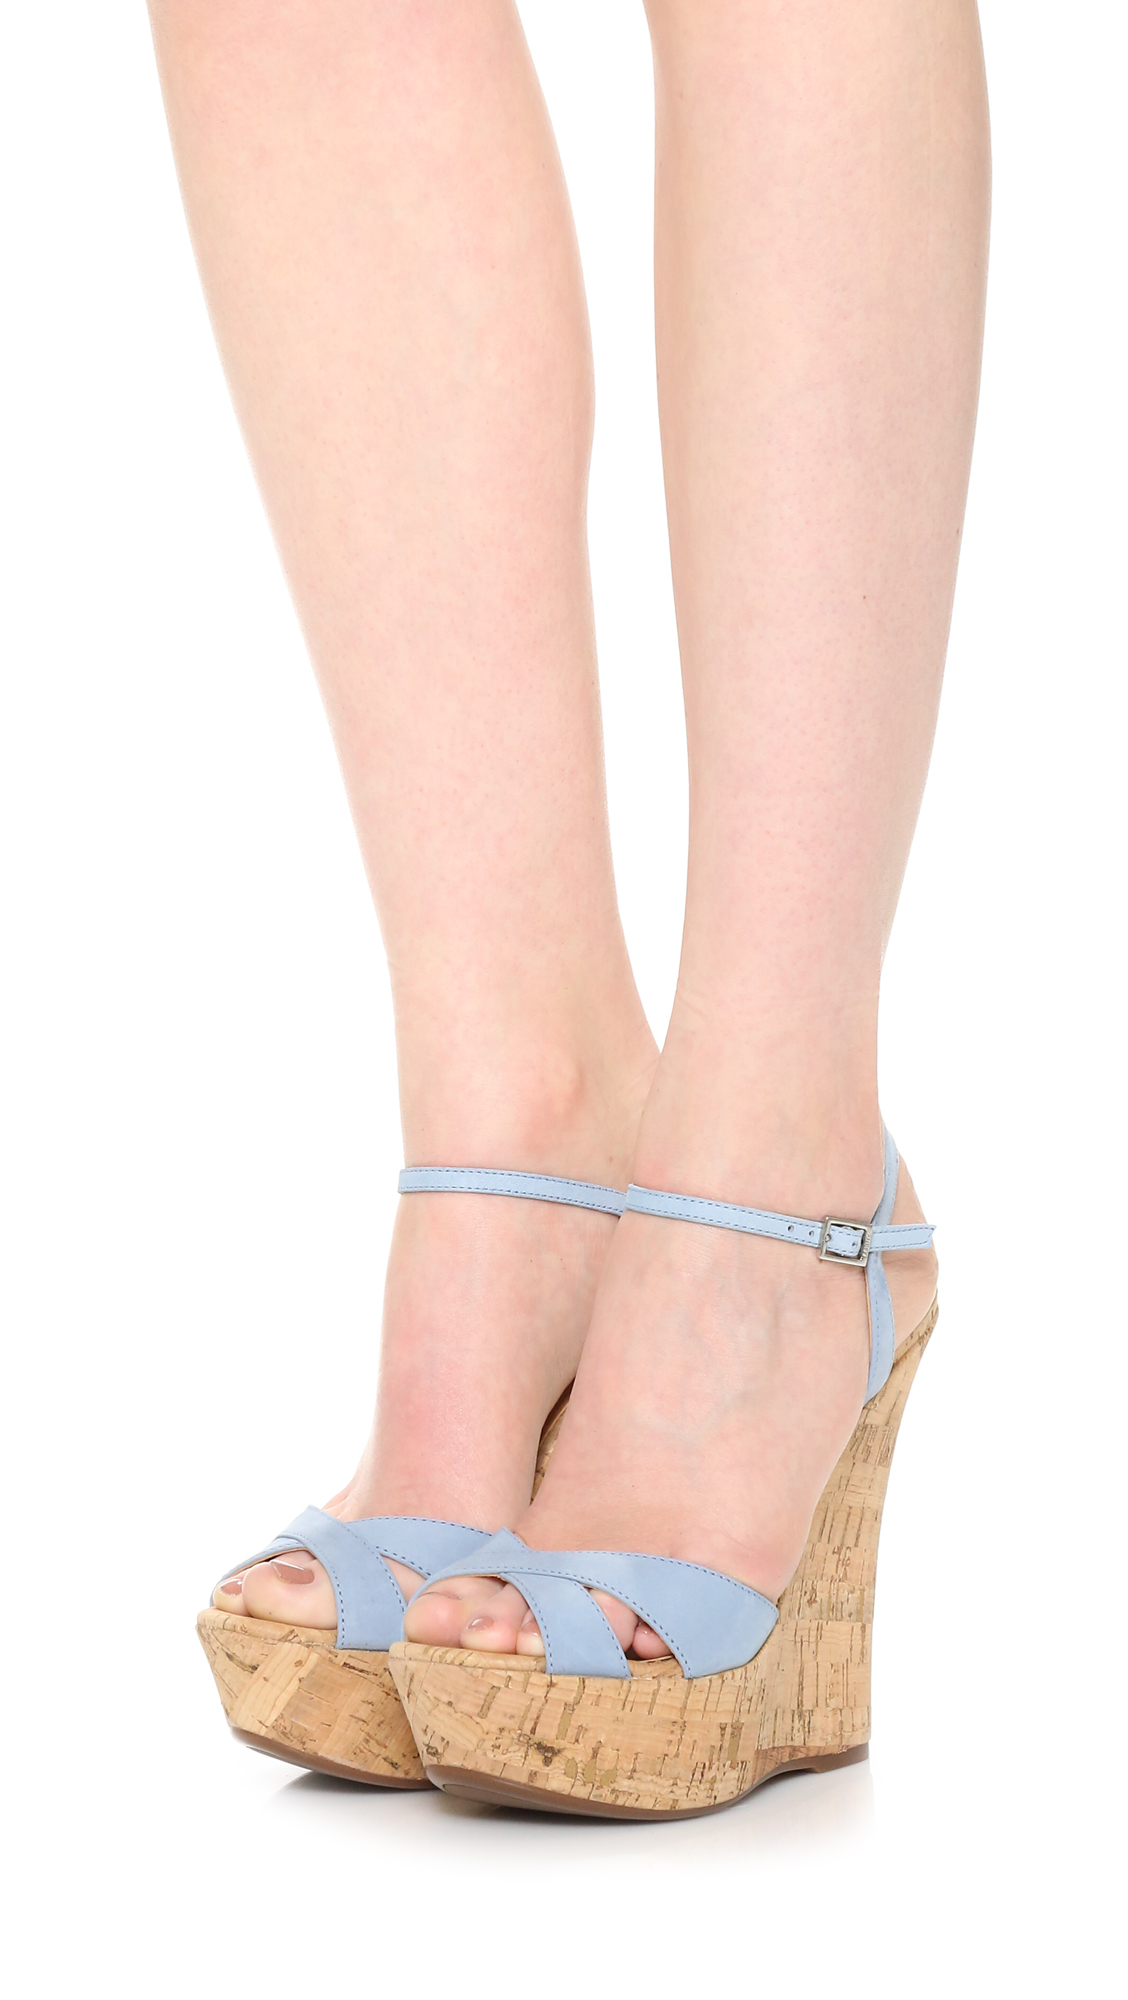 c06e52d30017 Lyst - Schutz Emiliana Wedge Sandals in Blue